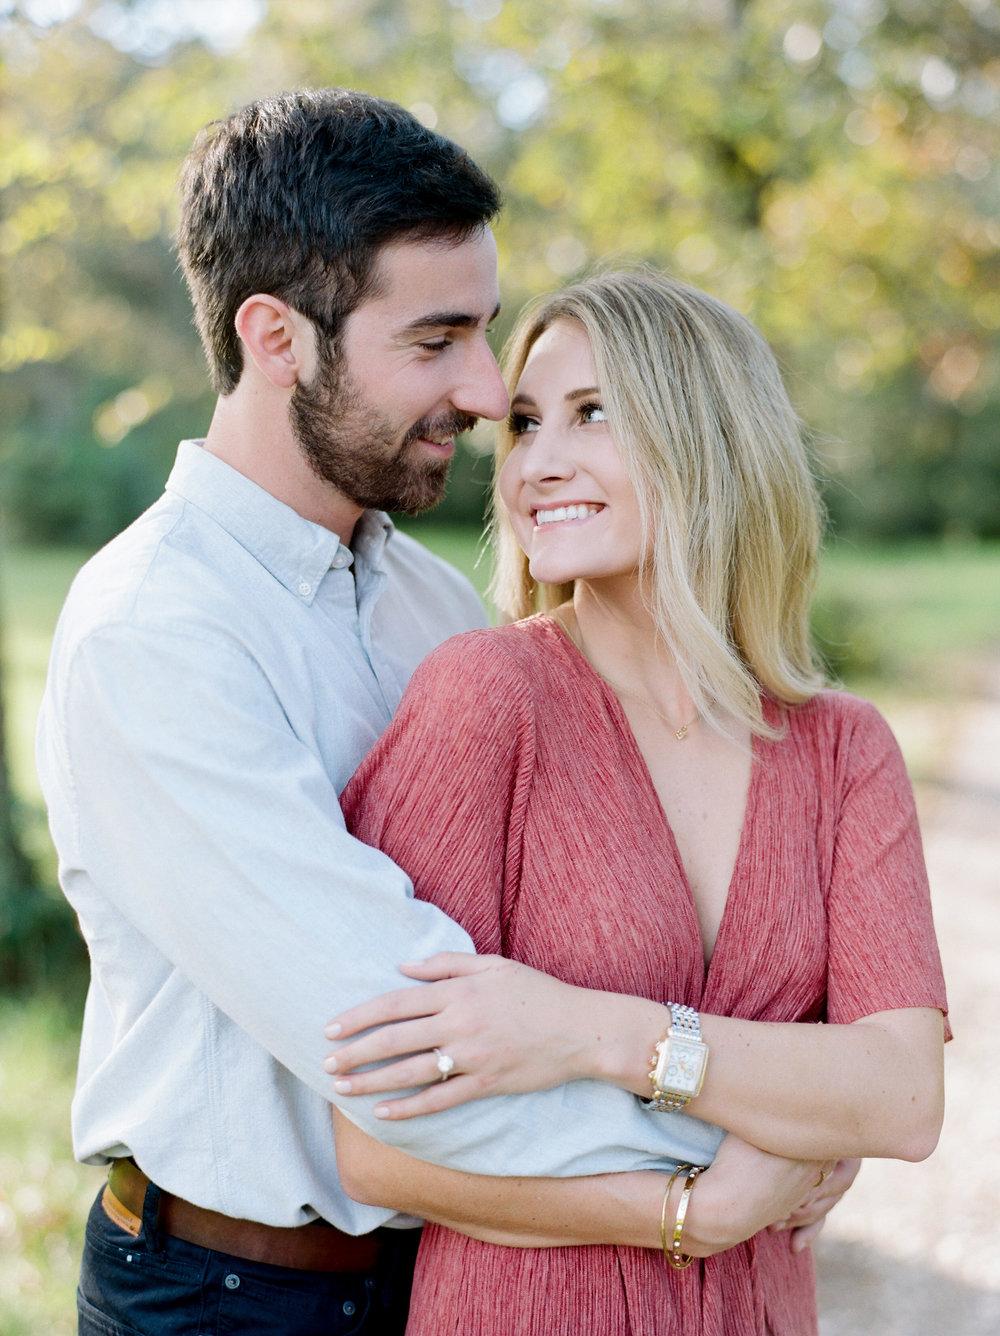 Houston-Wedding-Photographer-Best-Top-Luxury-Destination-Engagements-Portrait-Austin-Photography-5.jpg